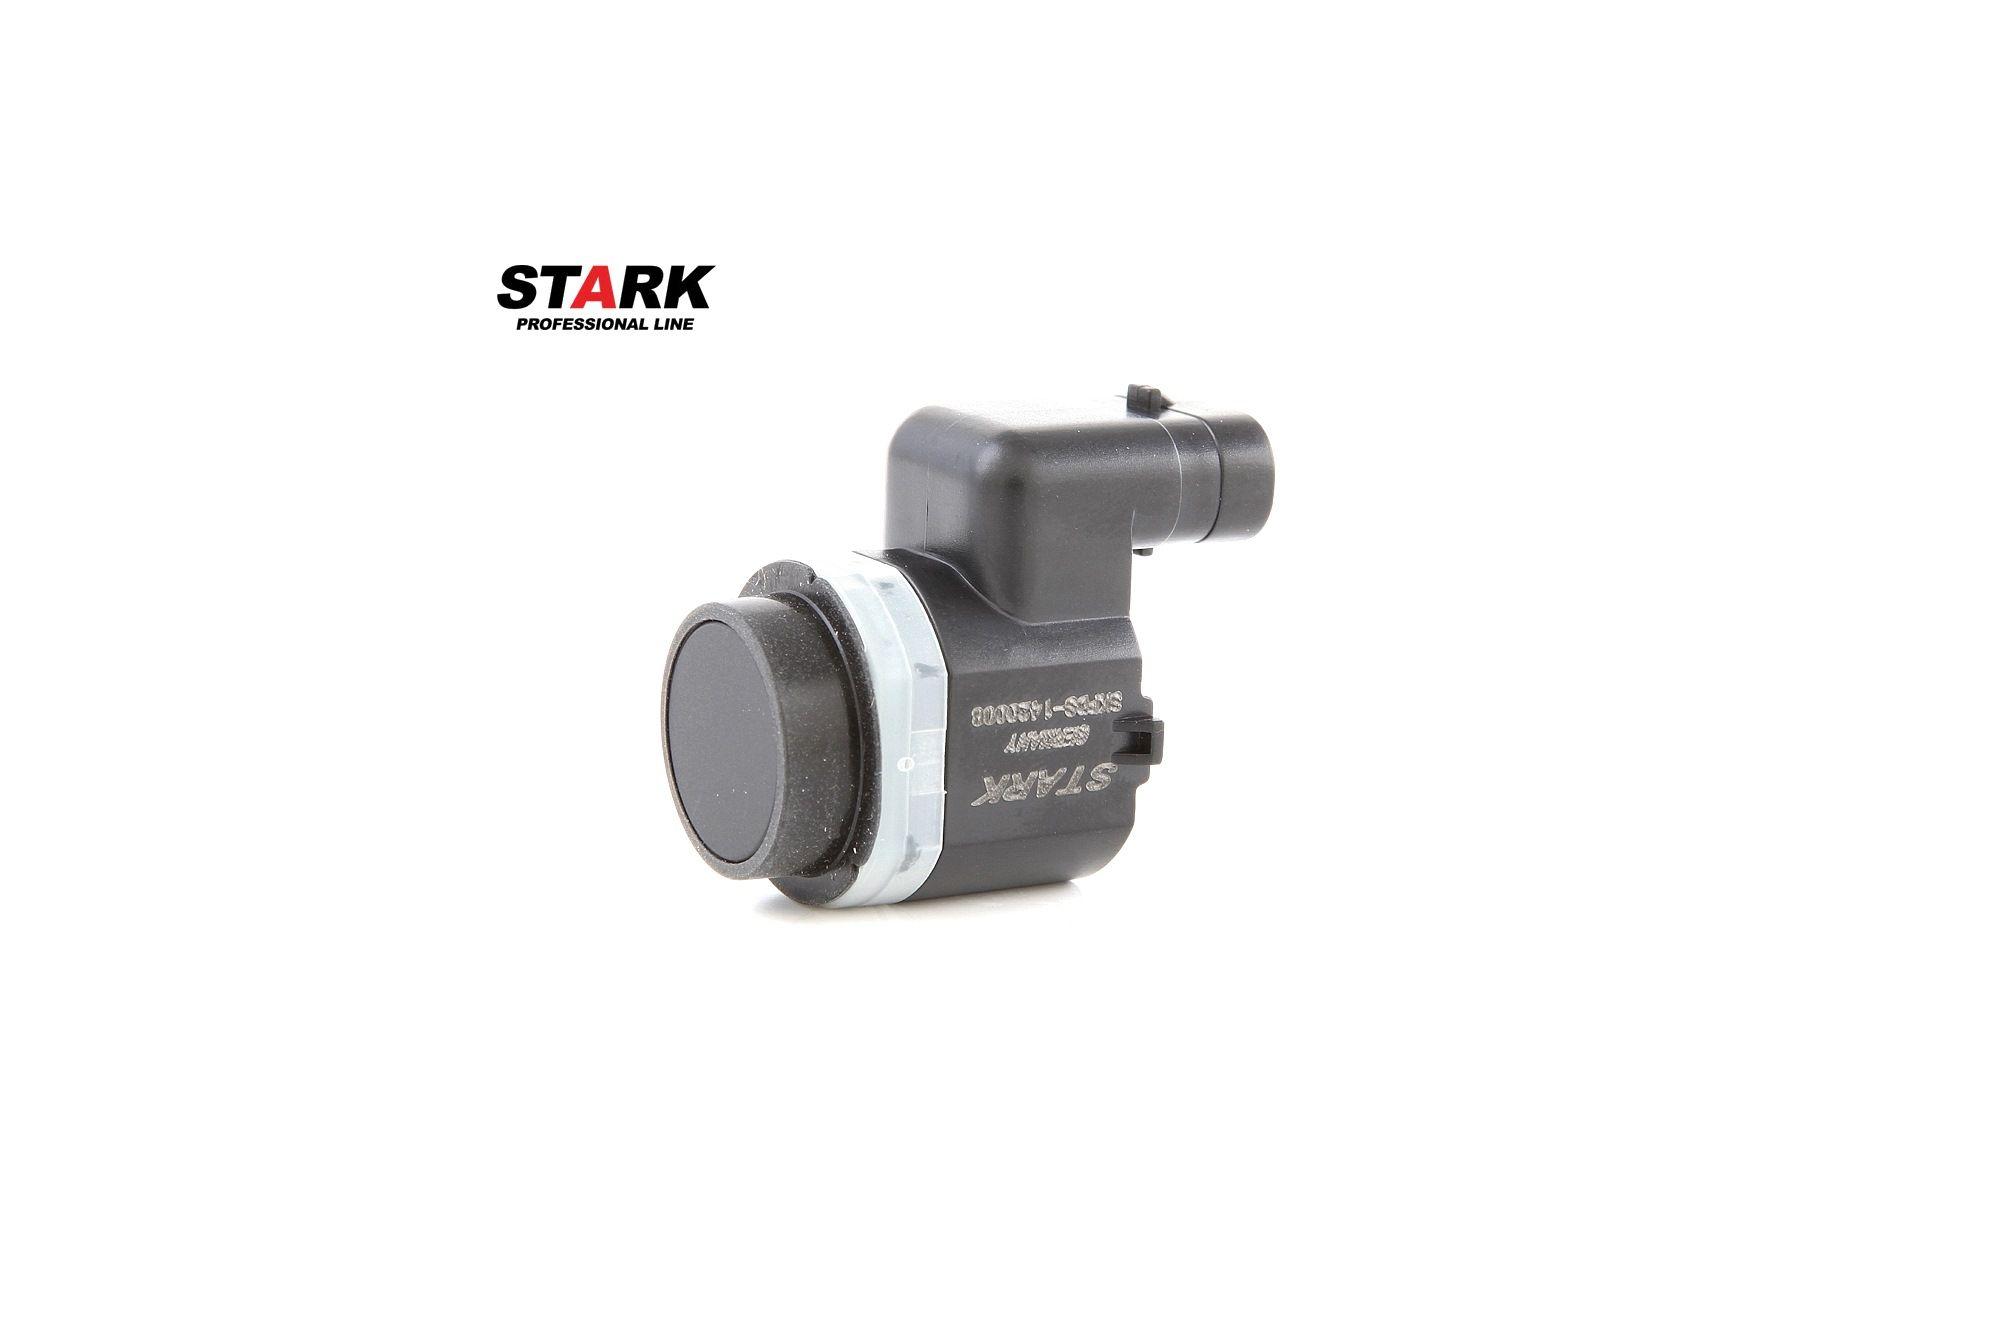 SKPDS-1420008 STARK innen, vorne, Ultraschallsensor Sensor, Einparkhilfe SKPDS-1420008 günstig kaufen